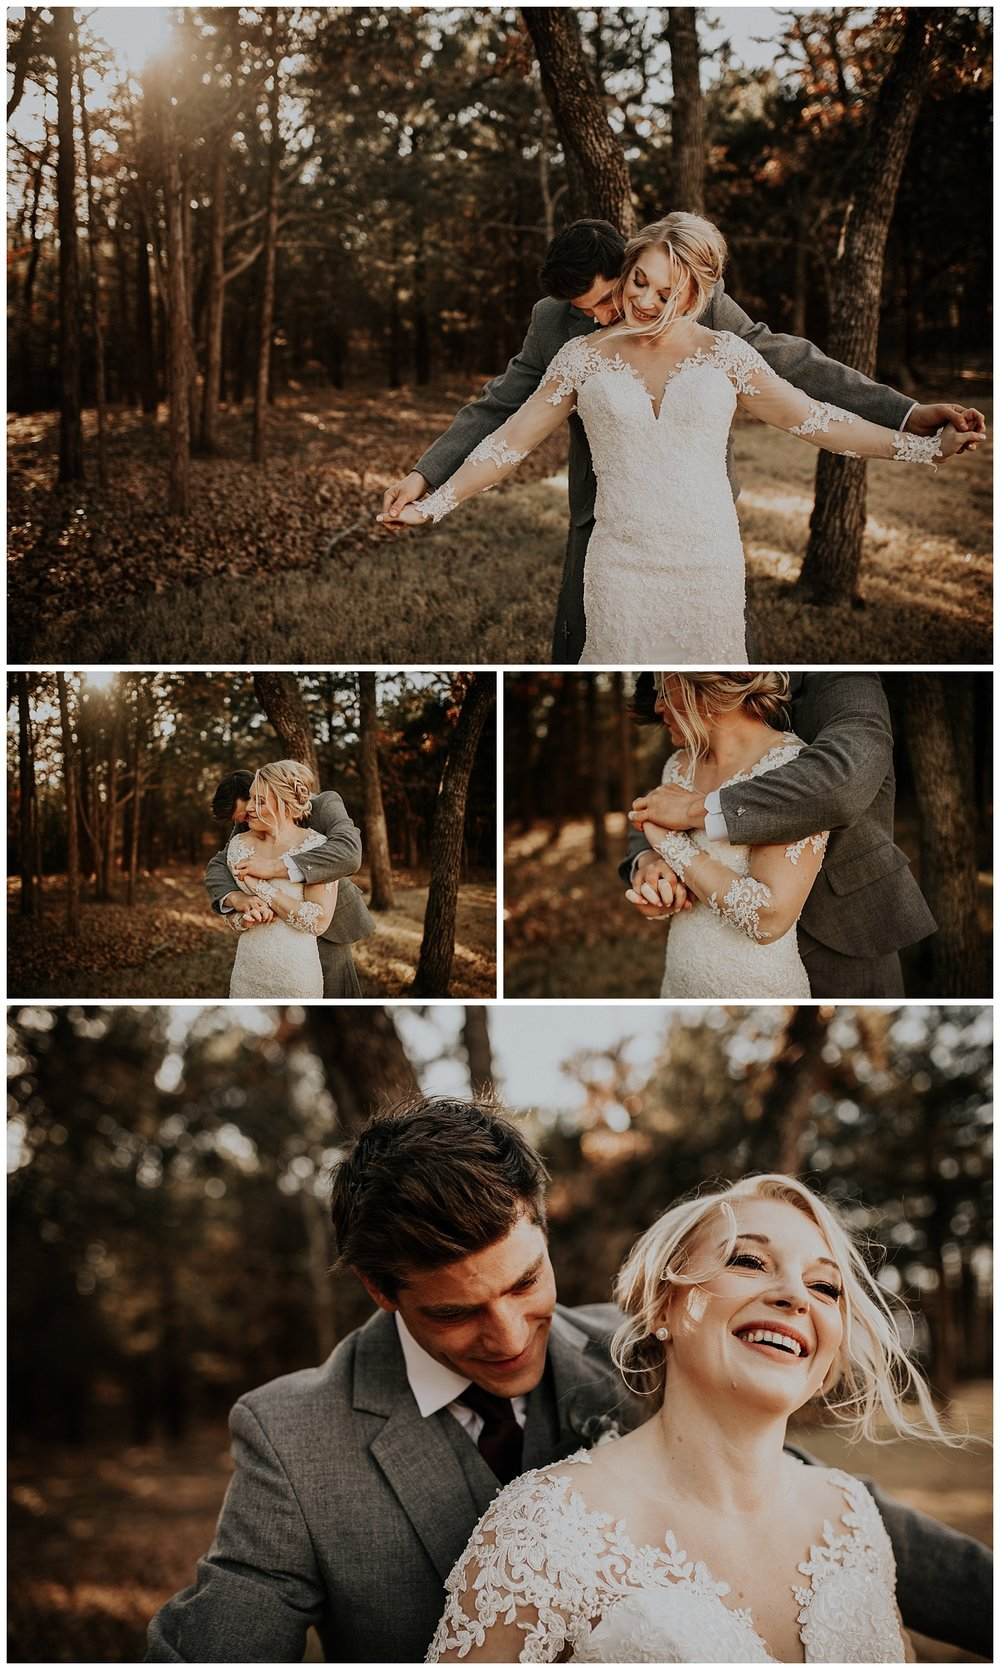 Laken-Mackenzie-Photography-Palm-Whispering-Oaks-Wedding-Venue-Dallas-Wedding-Photographer18.jpg